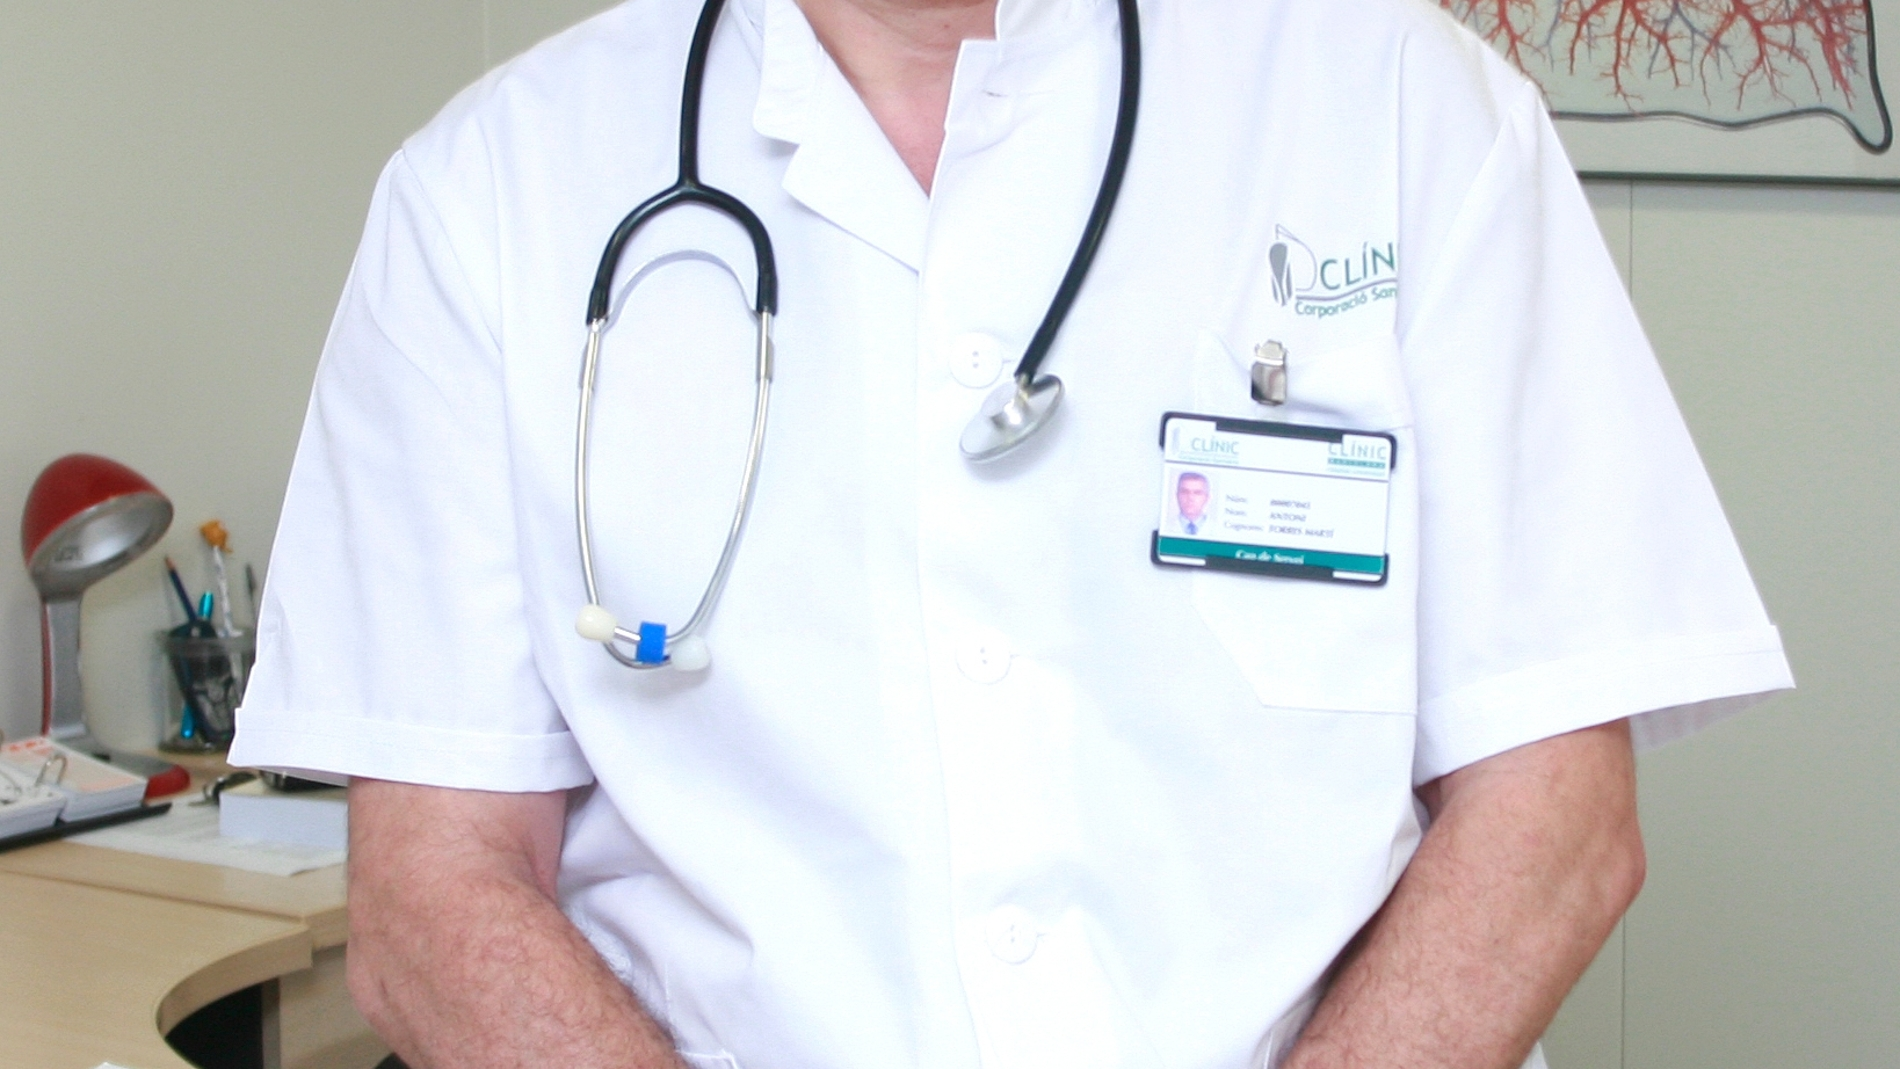 Dr. Antoni Torres